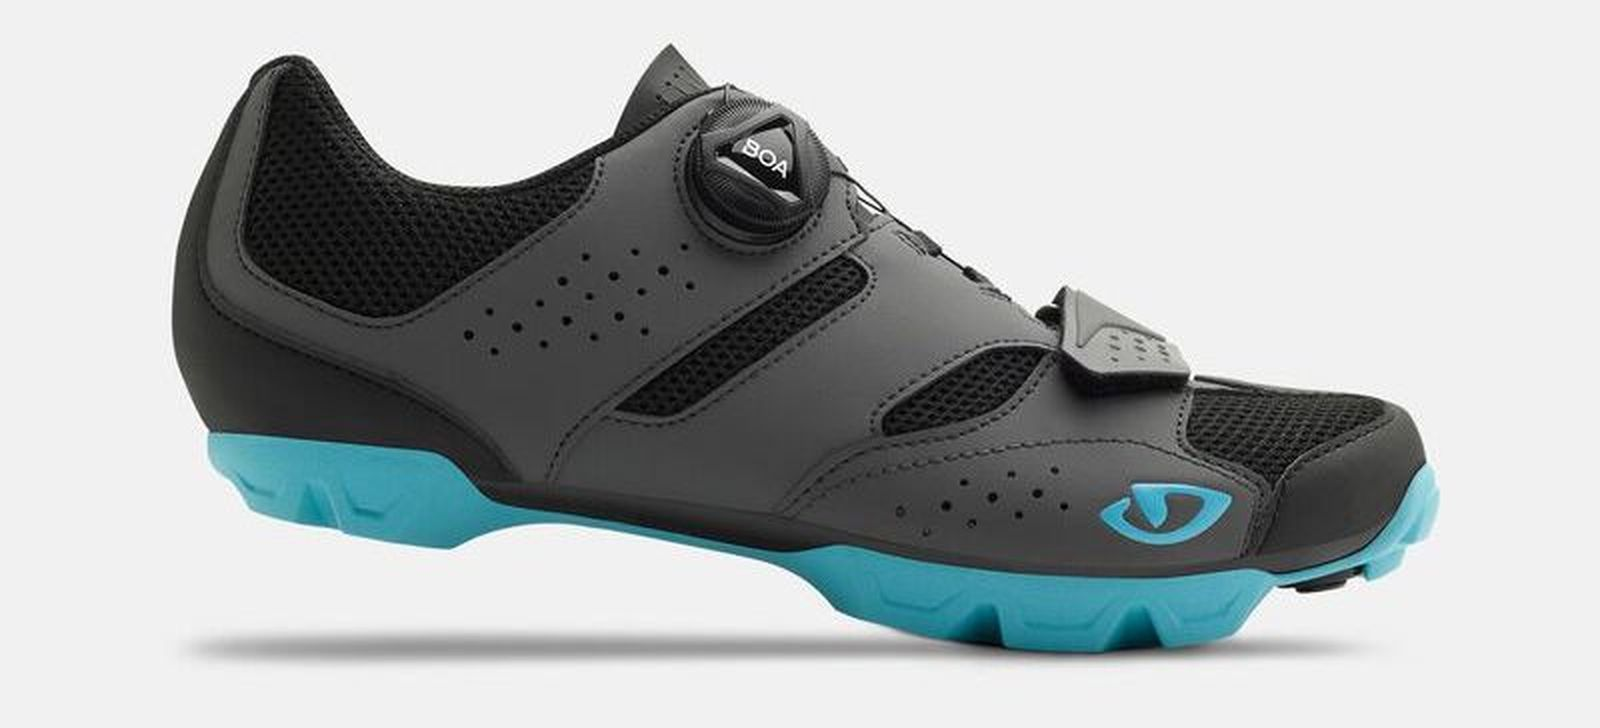 giro-cylinder-w-womens-dirt-shoe-dark-shadow-iceberg-profile best women's mtb shoes